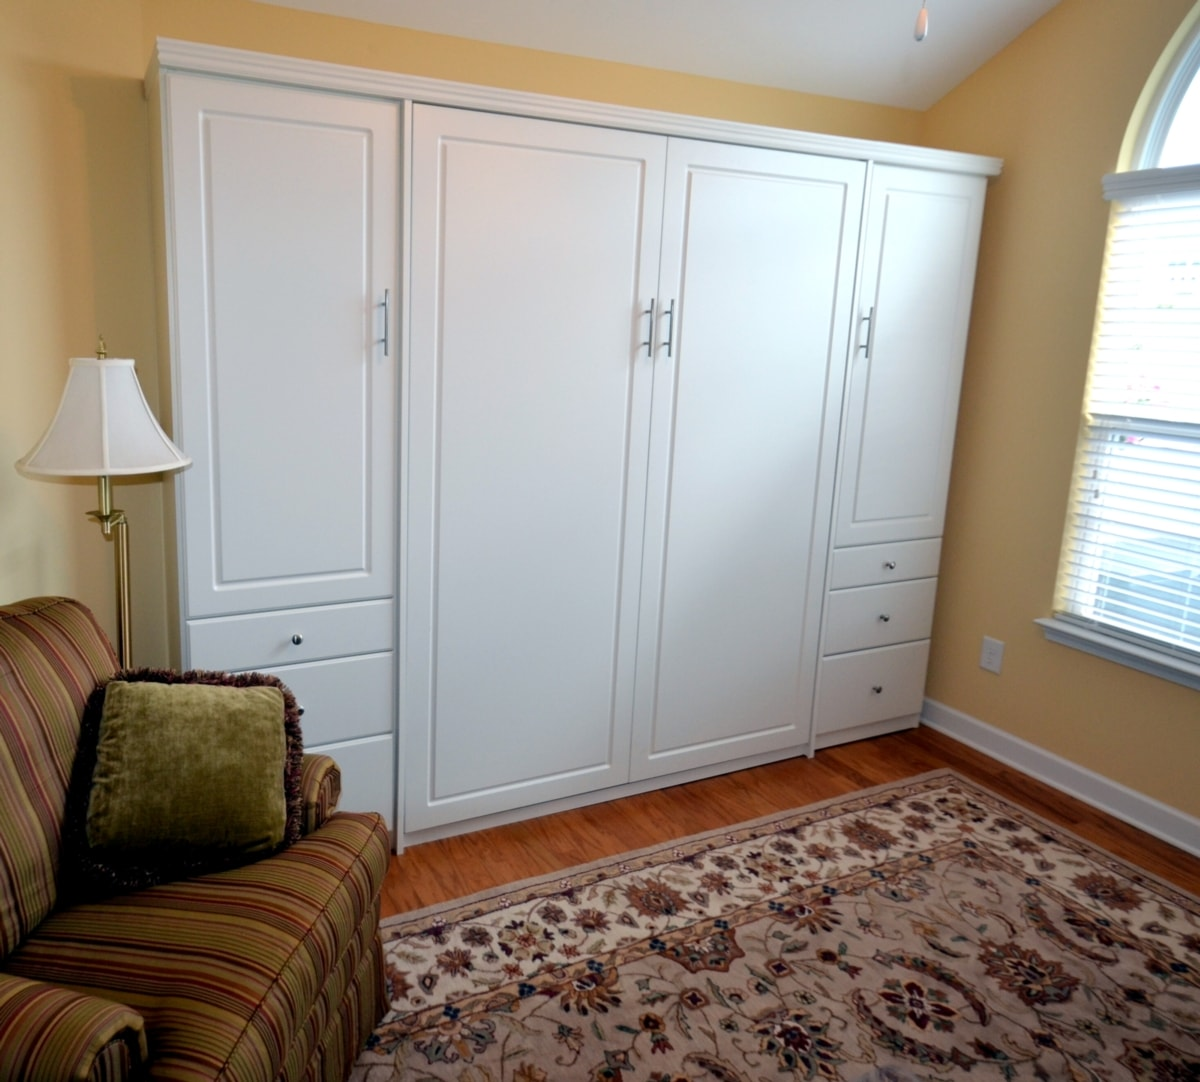 Wall Beds Closet Curves Ets Displays